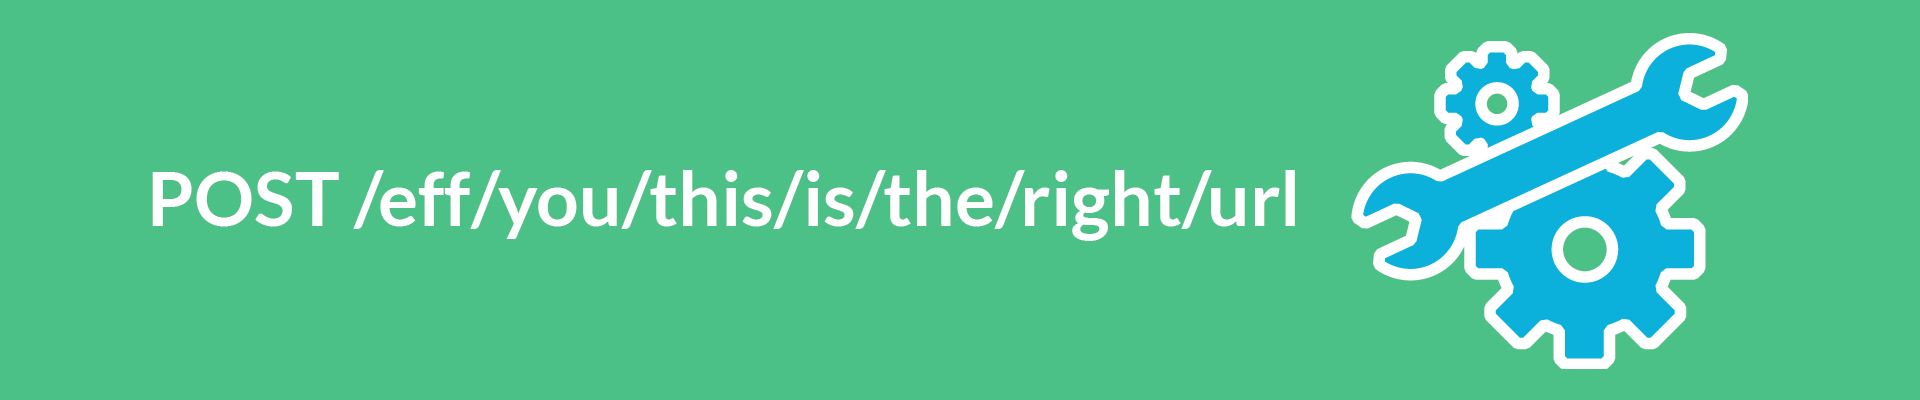 RESTful API Design